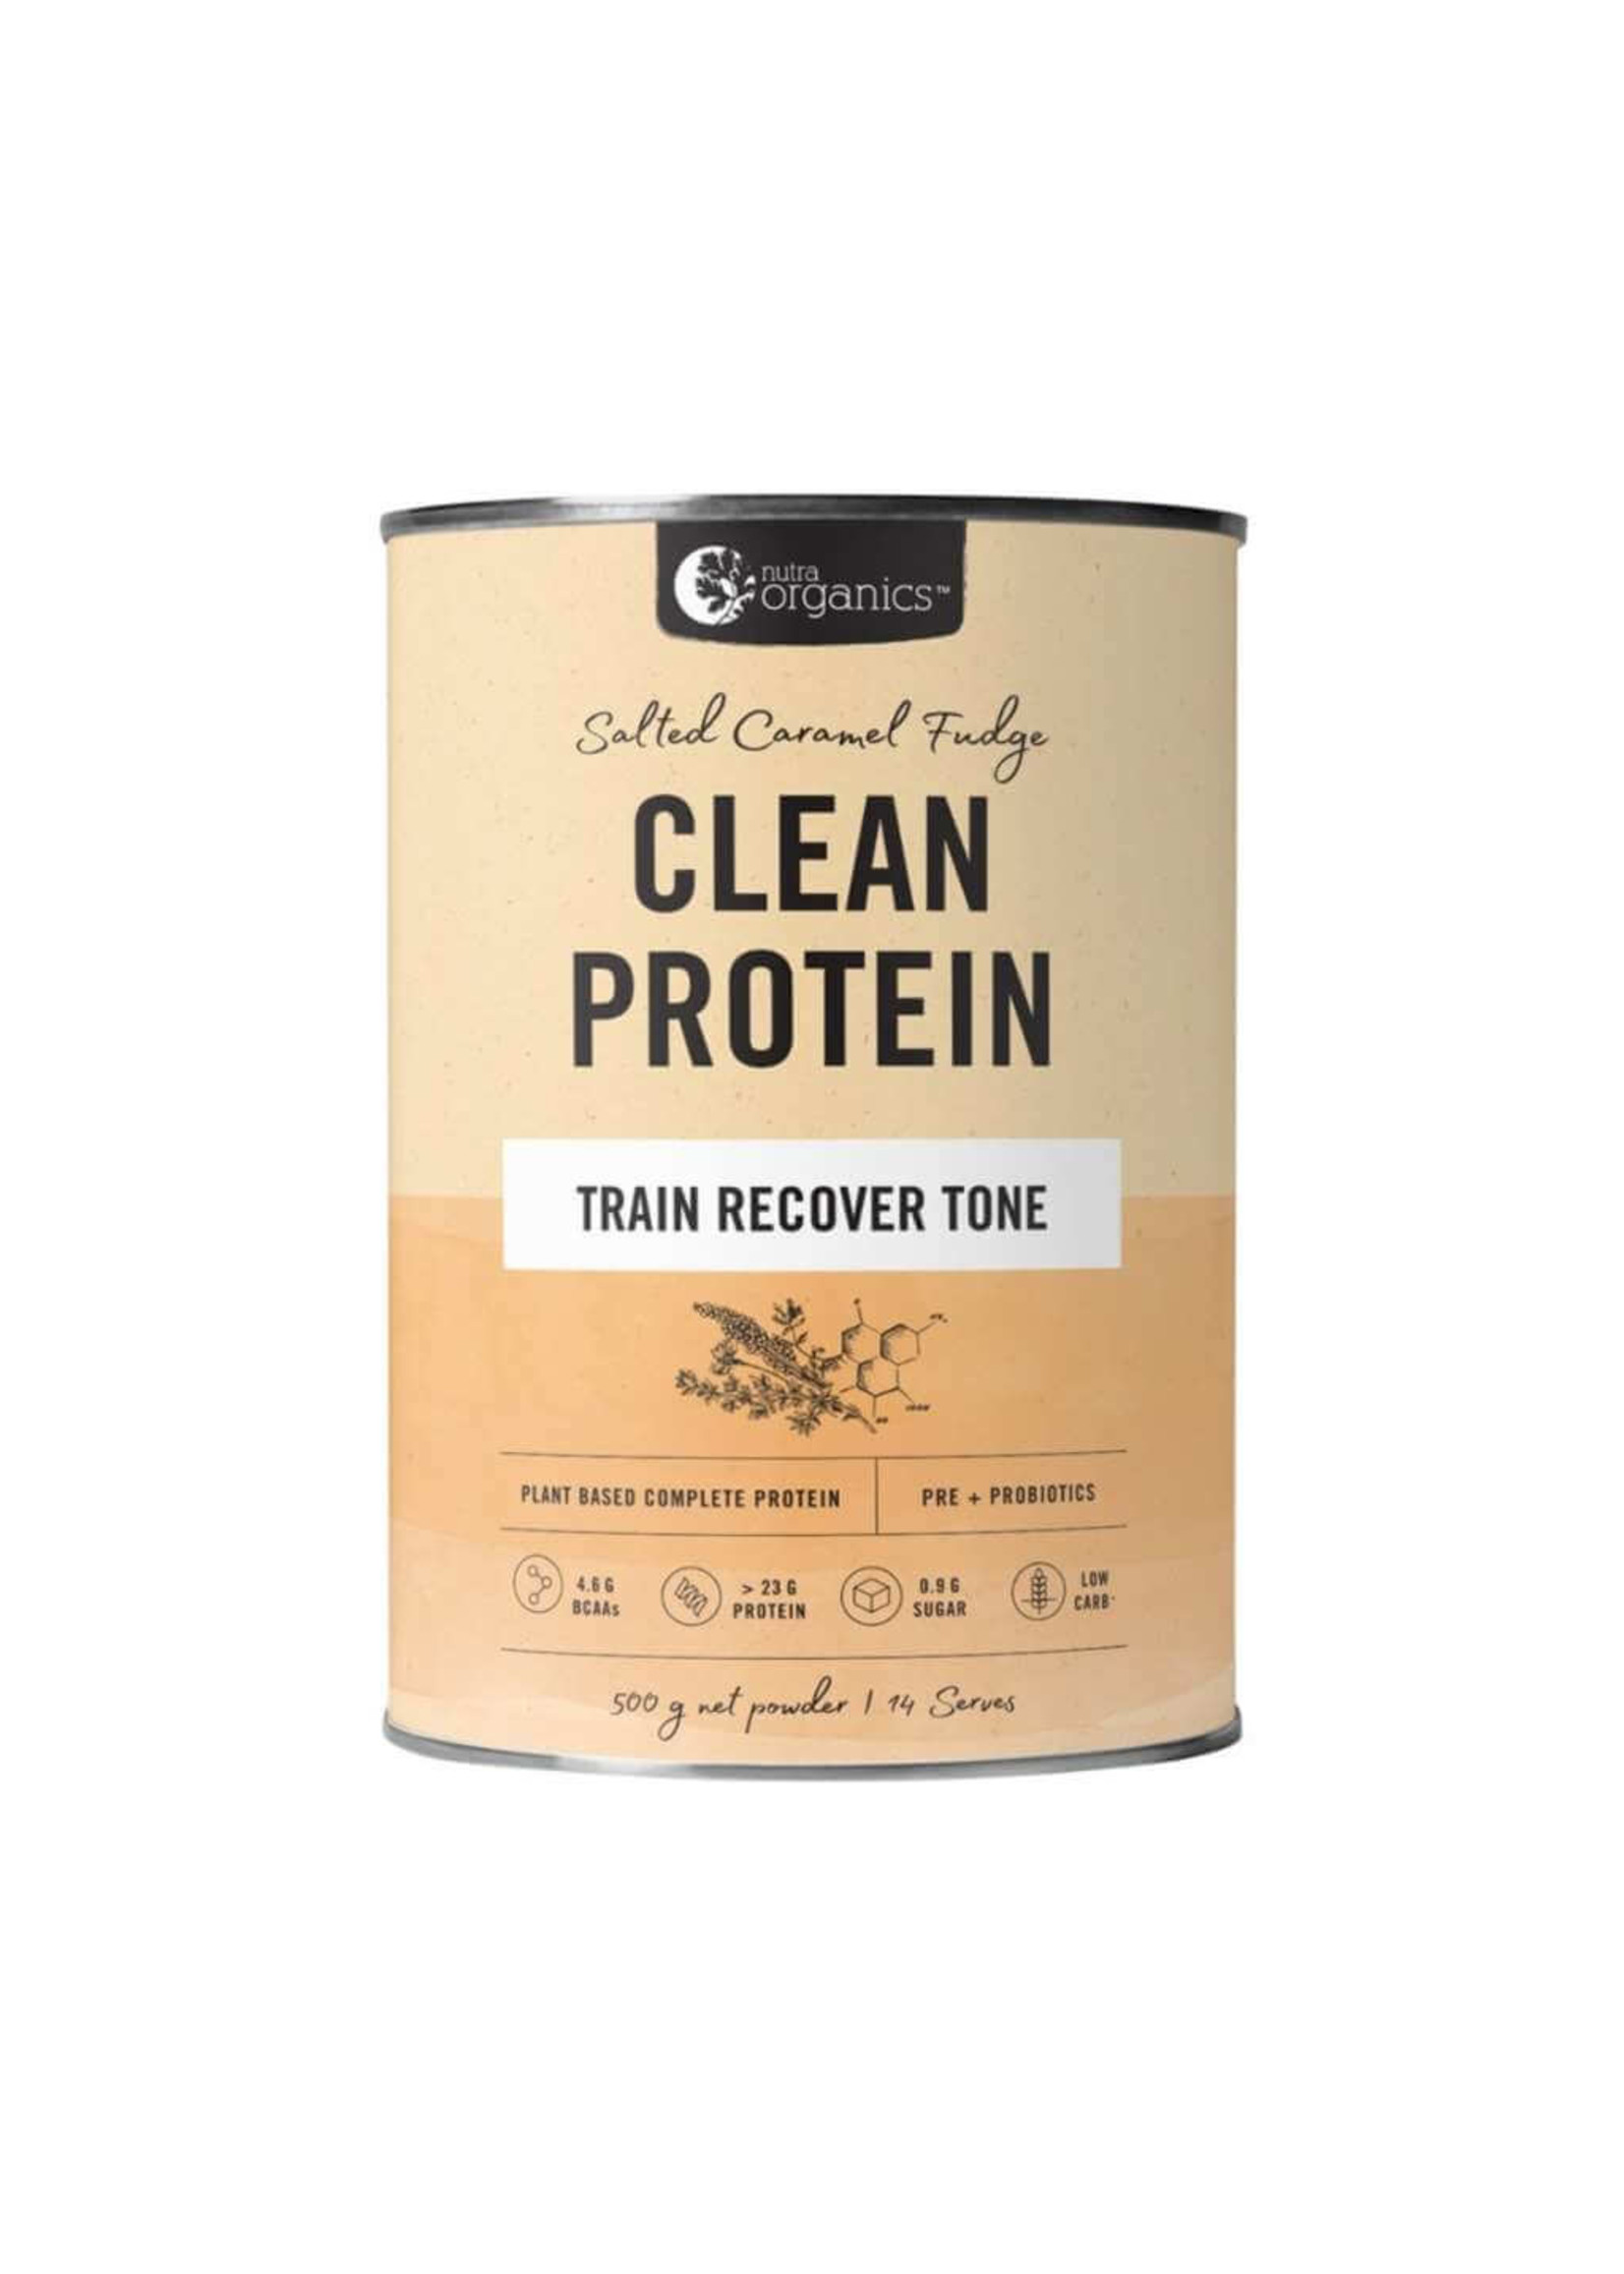 Nutra Organics Nuta Organics Clean Protein Salted Caramel Fudge 500g